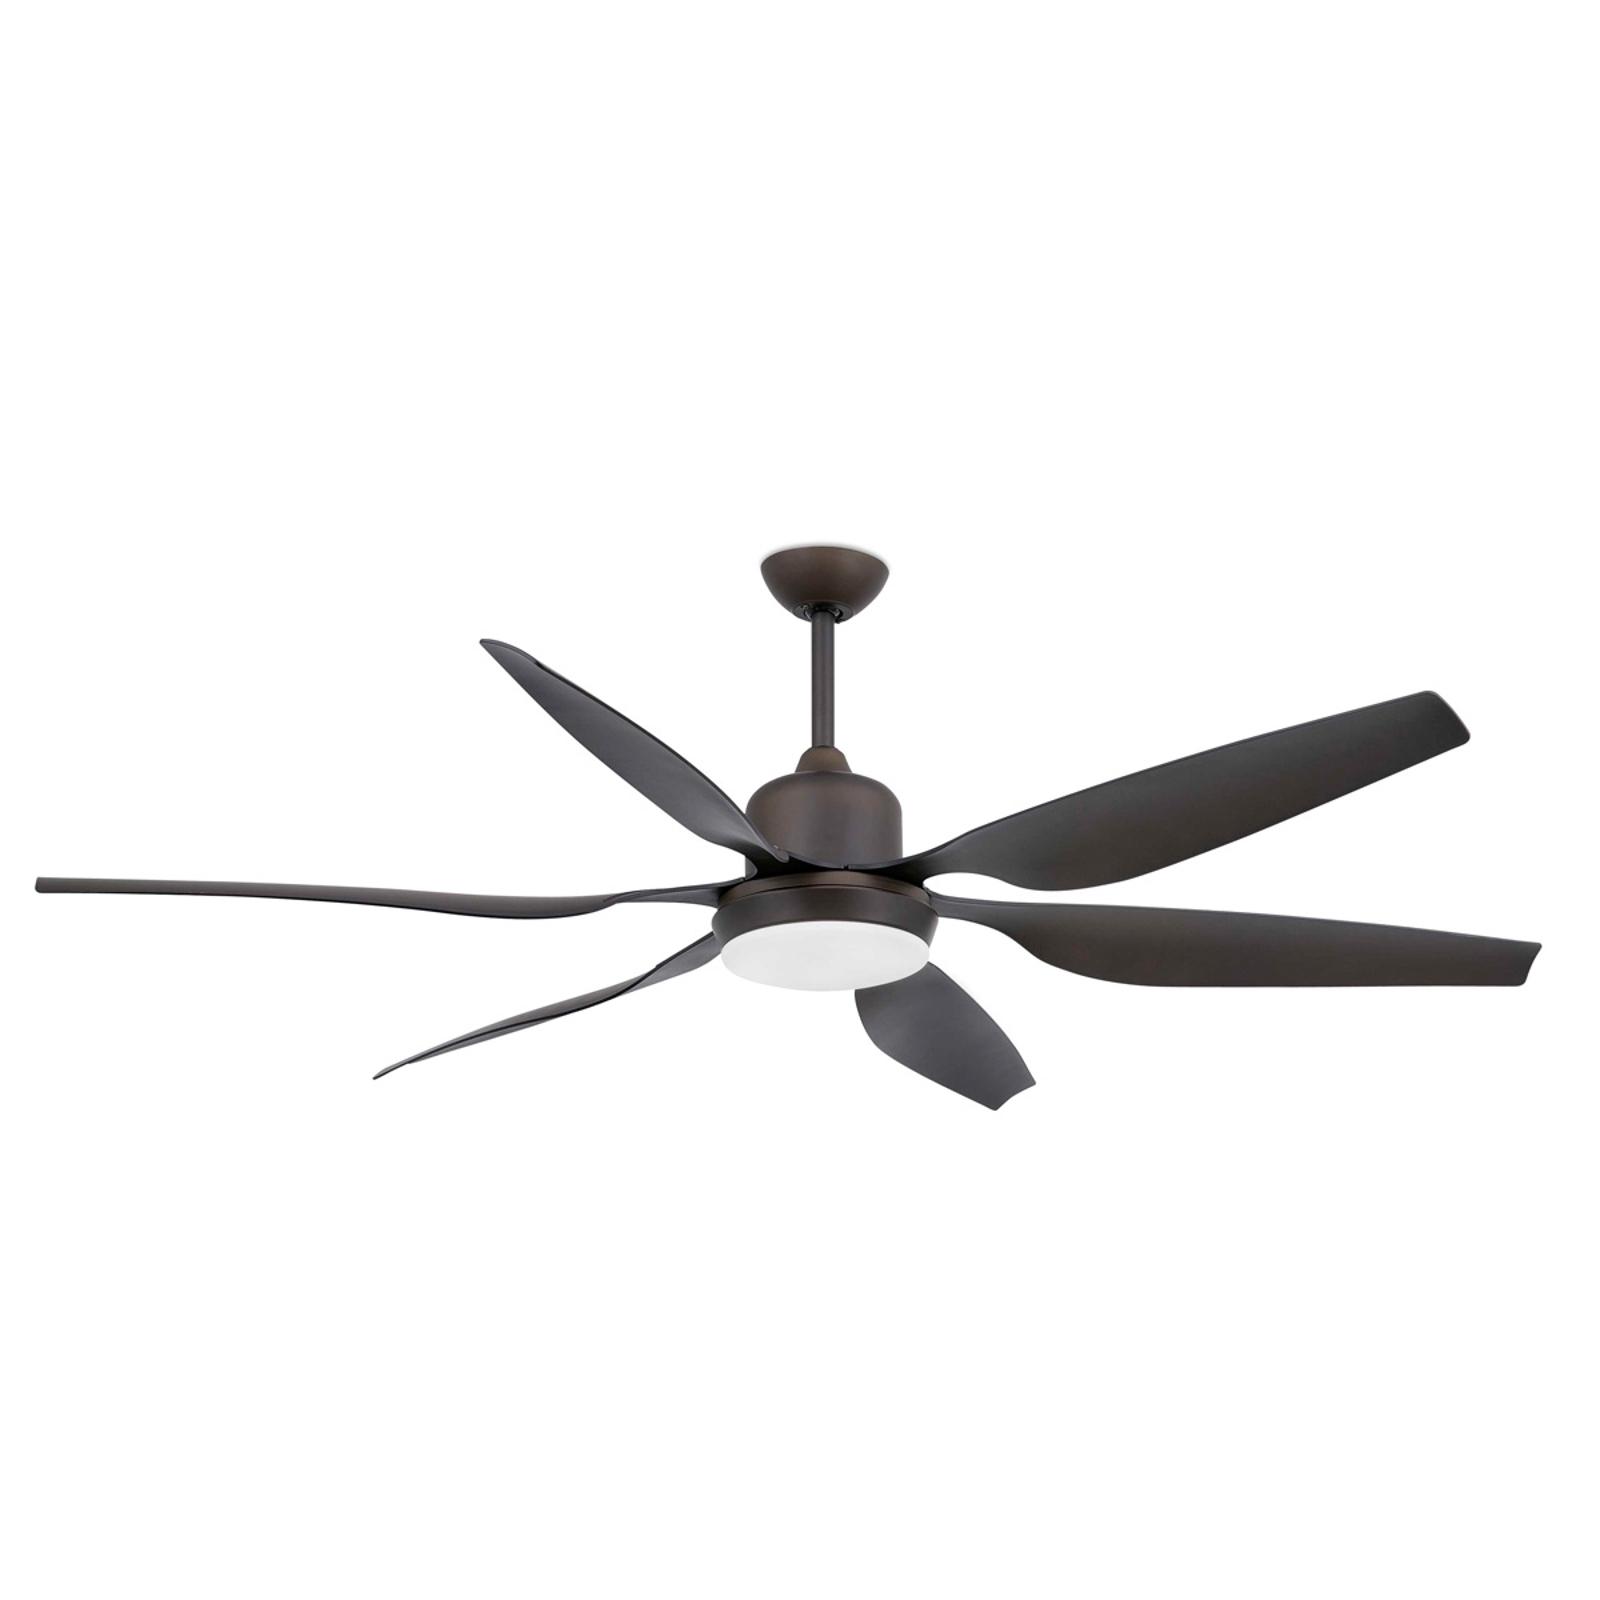 Imposing Tilos ceiling fan with light_3506899_1